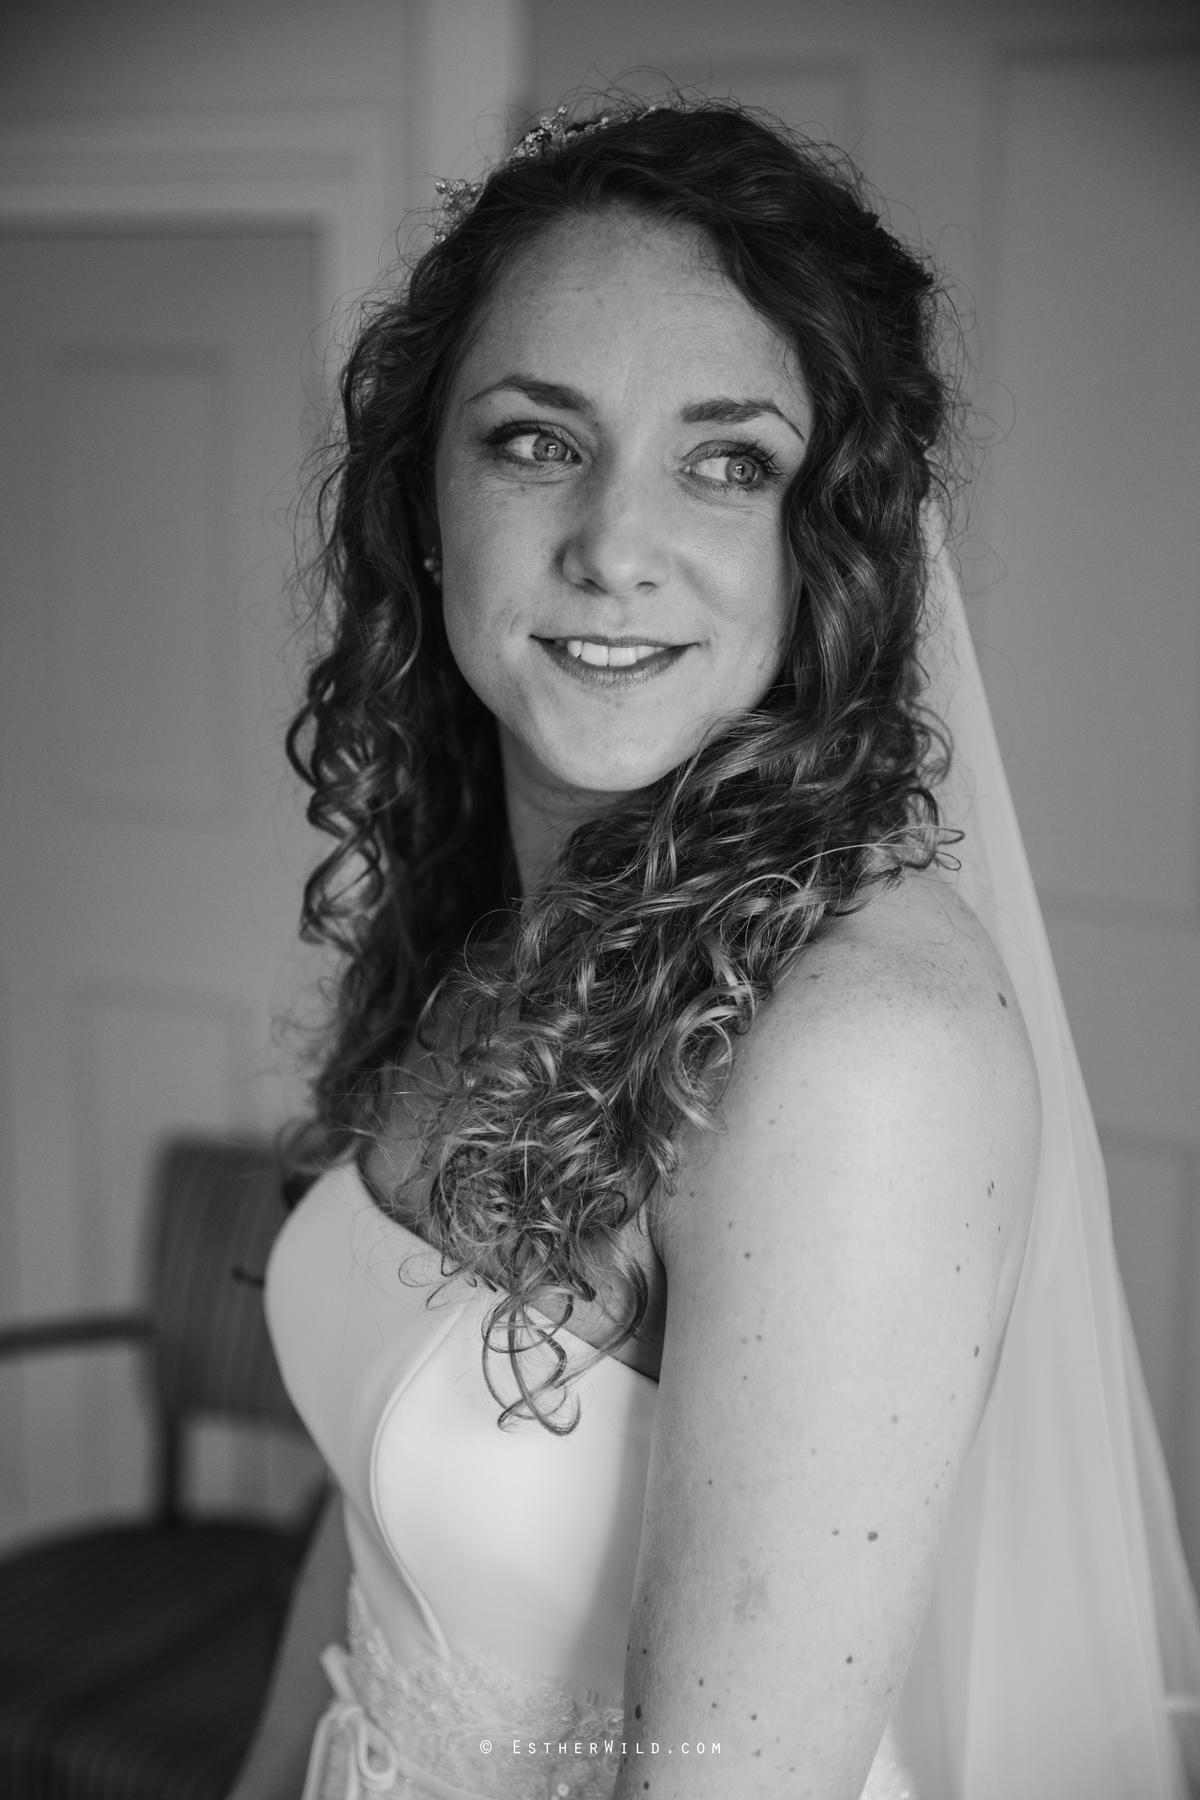 The_BoatHouse_Wedding_Venue_Ormesby_Norfolk_Broads_Boat_Wedding_Photography_Esther_Wild_Photographer_IMG_0689-1.jpg